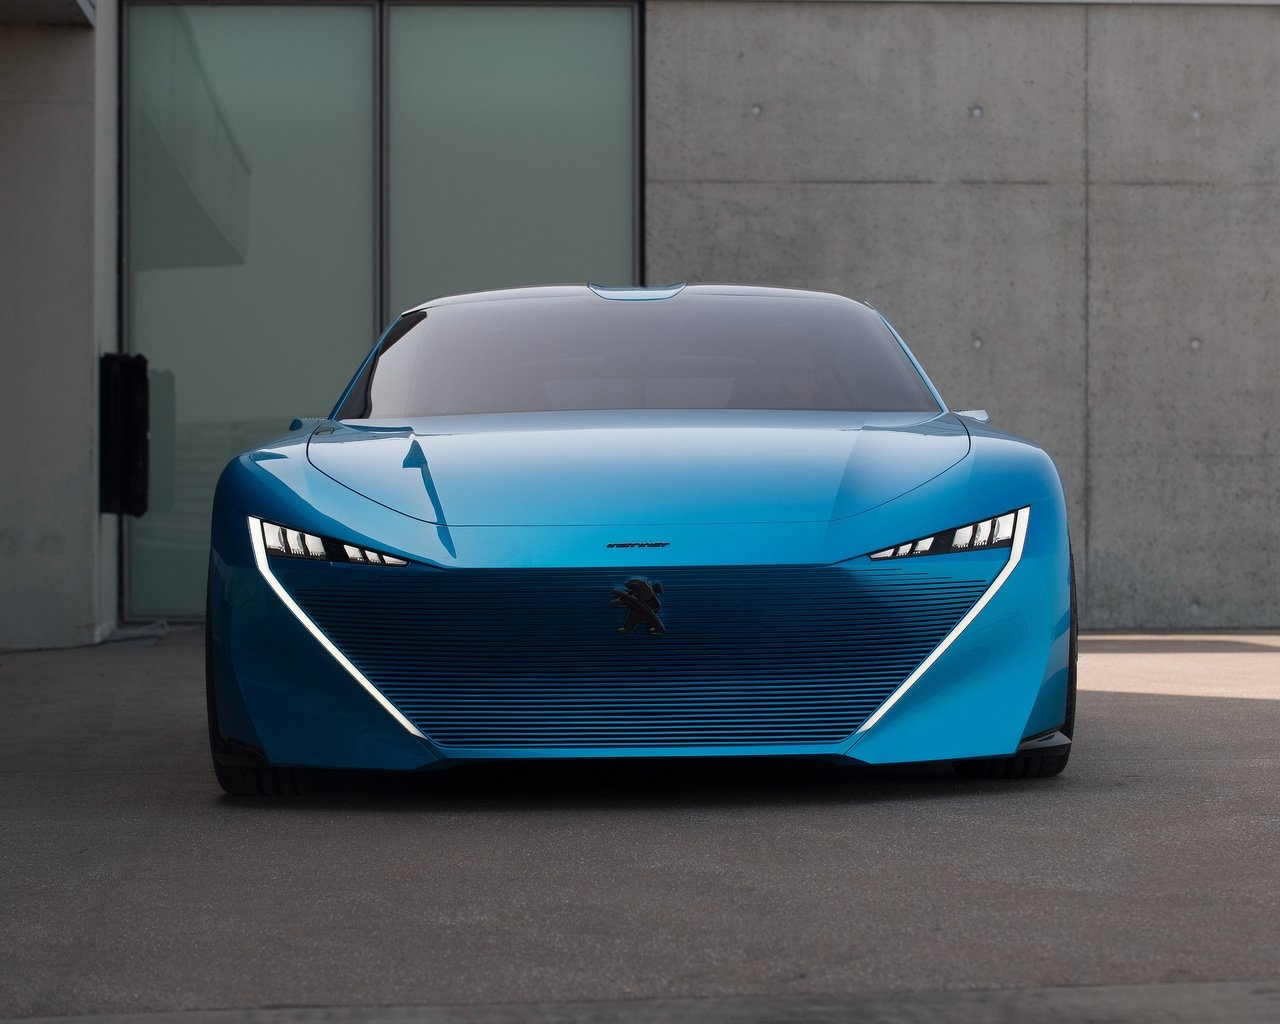 O que esperar do futuro Peugeot 308?